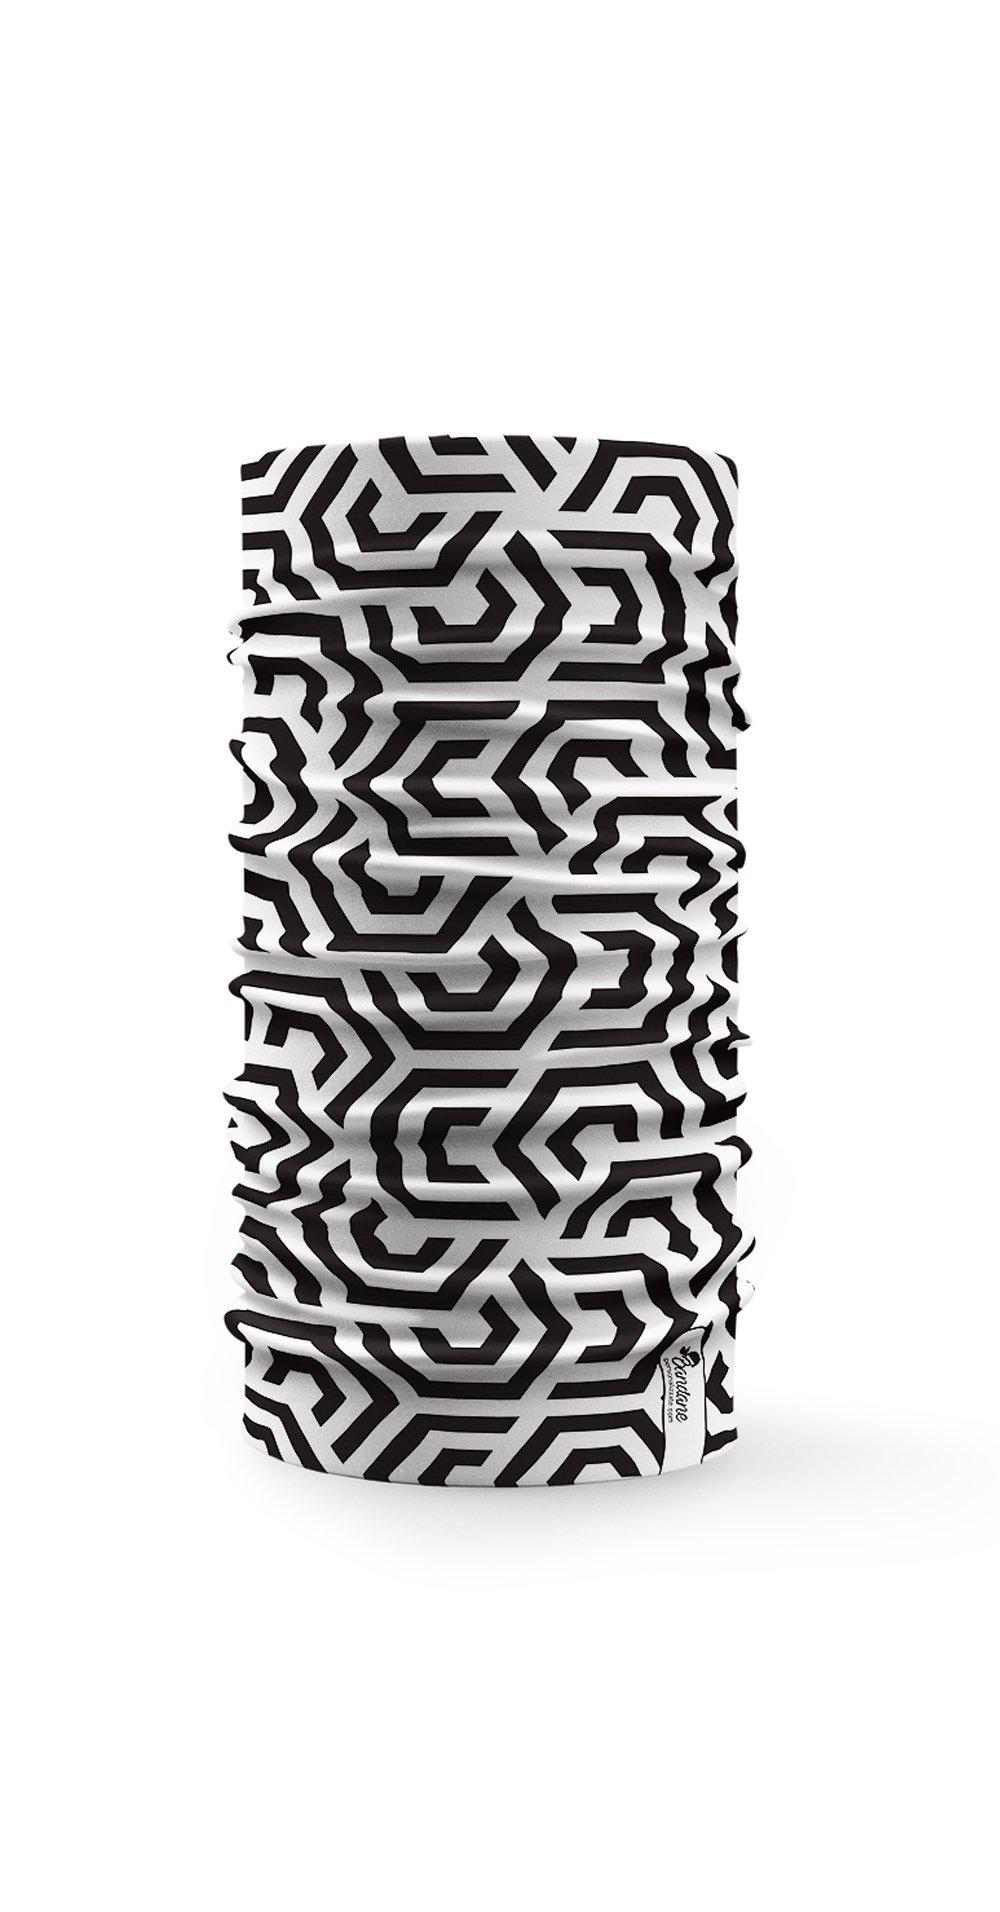 Disegni Geometrici Bianco E Nero bandane multifunzione con disegni geometrici in bianco e nero